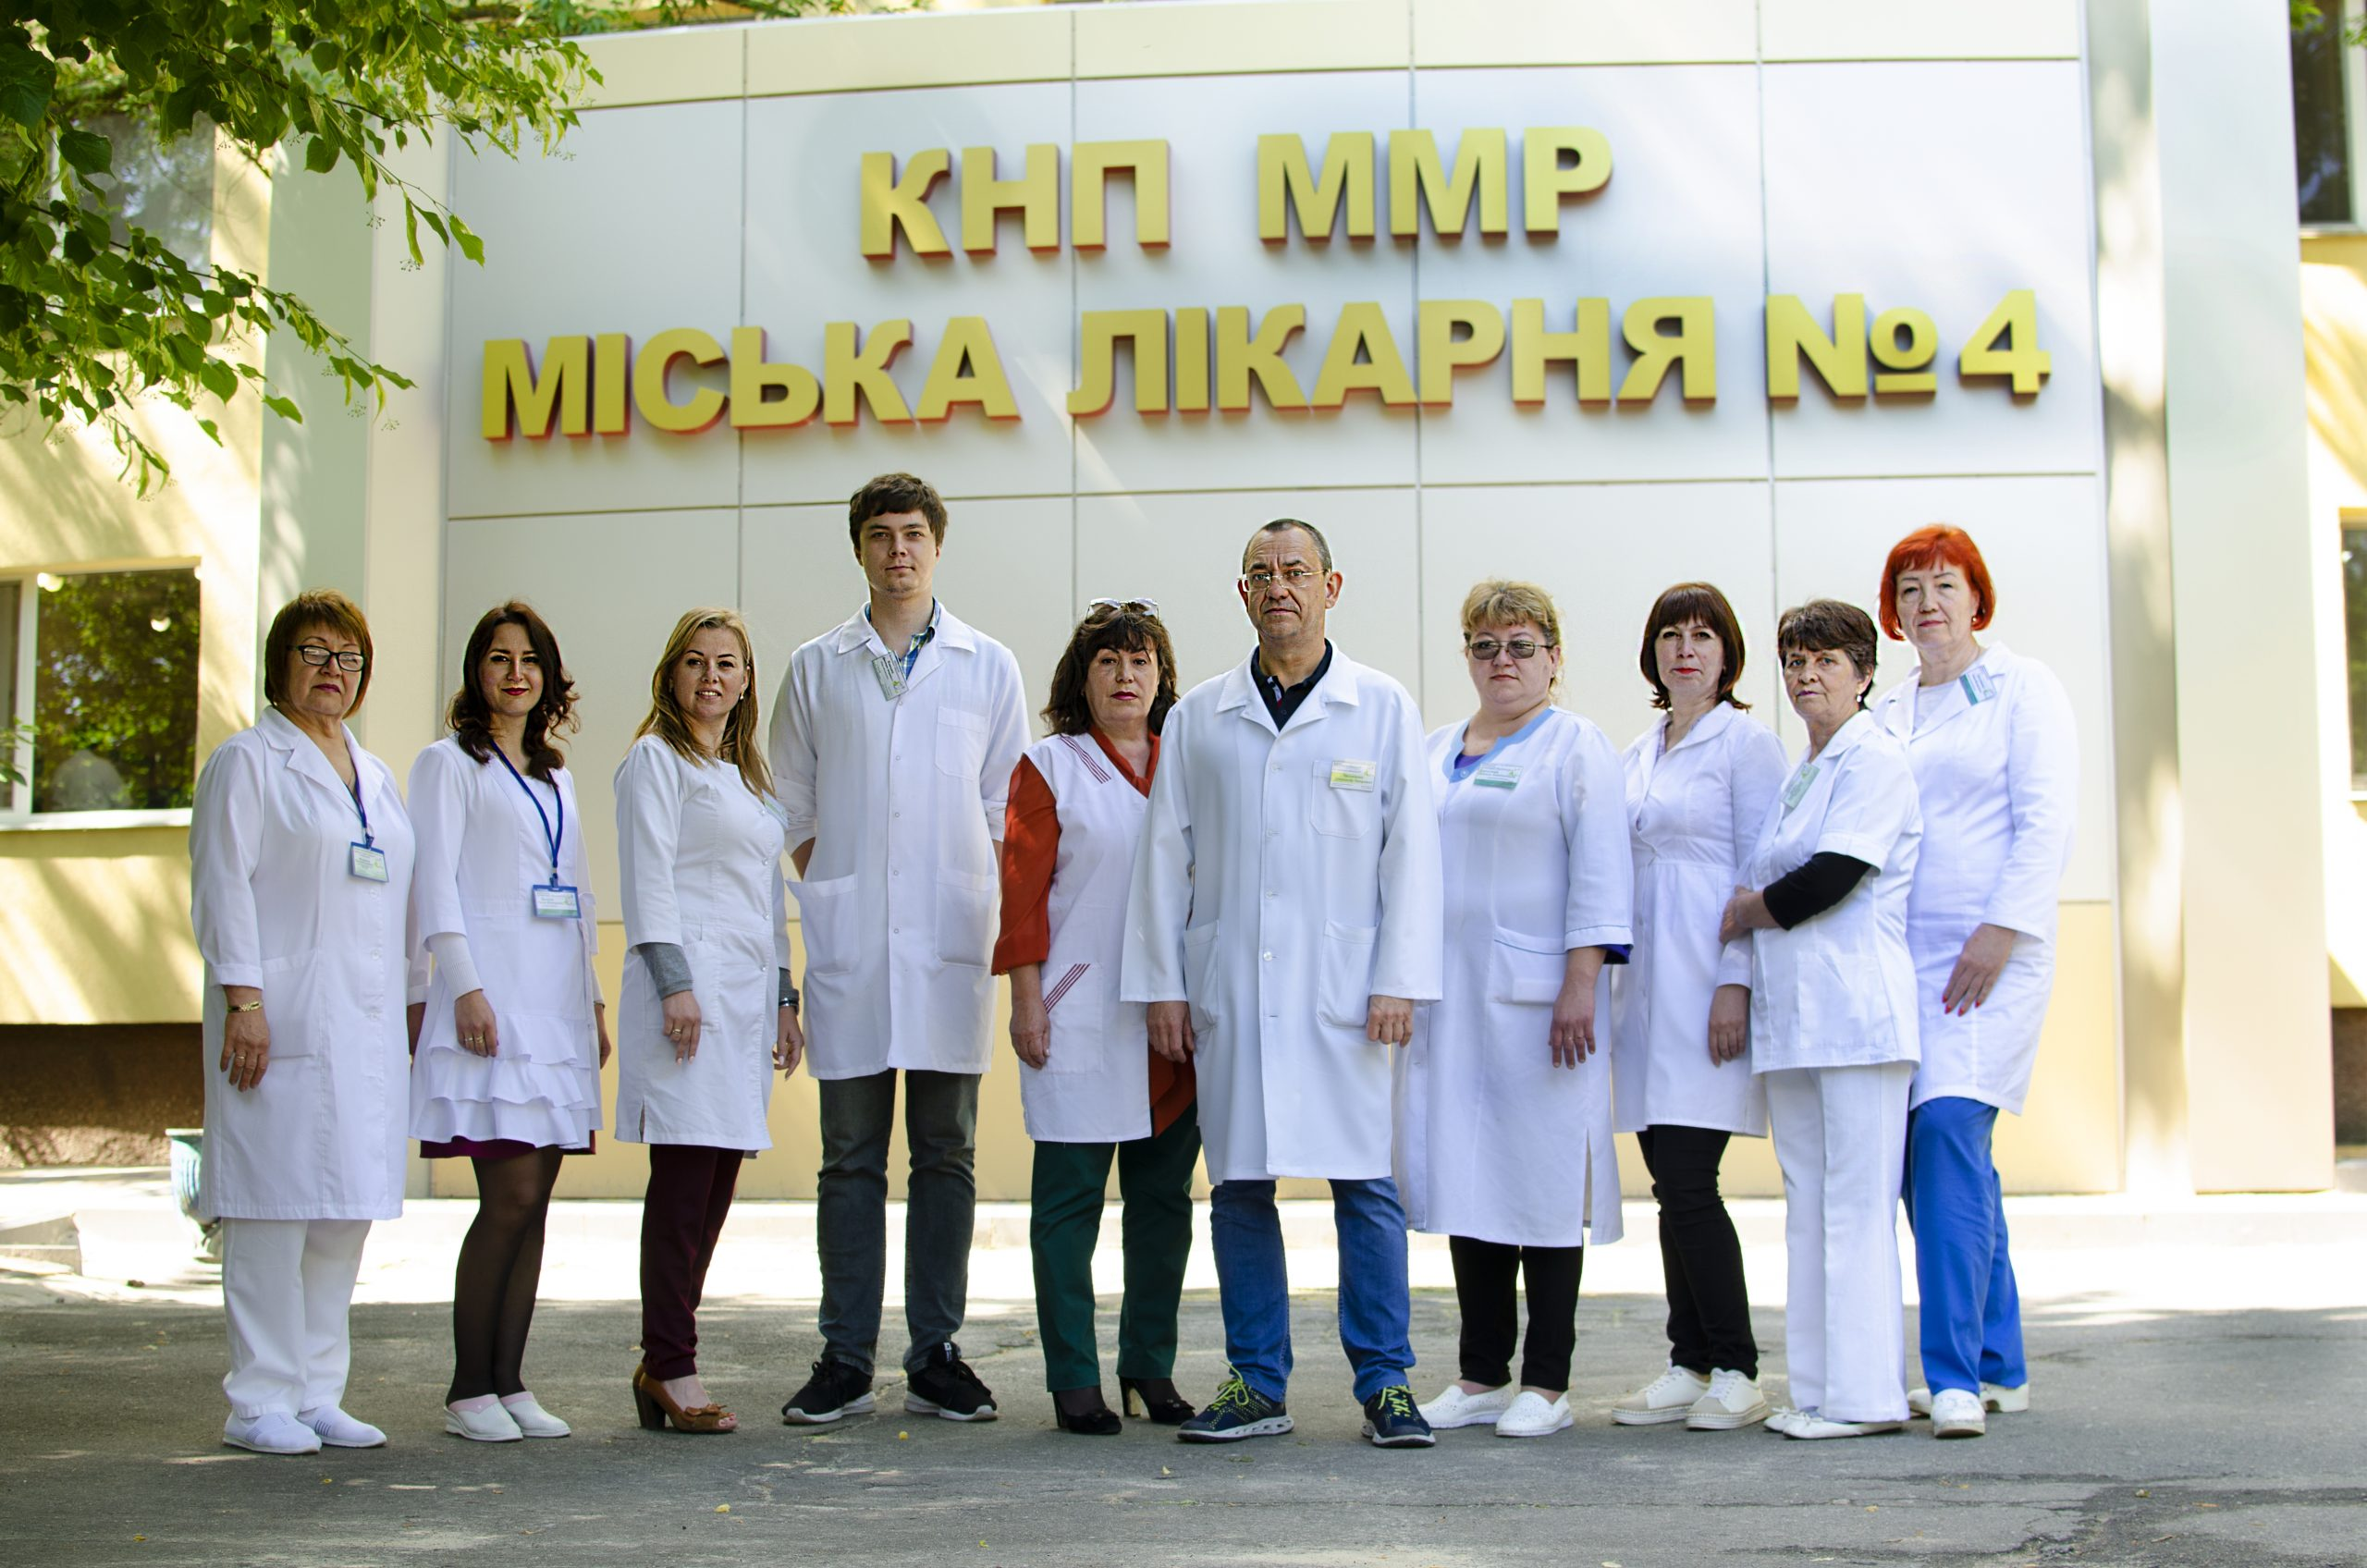 http://lik4.mk.ua/wp-content/uploads/2021/07/PHO_1525я-scaled.jpg